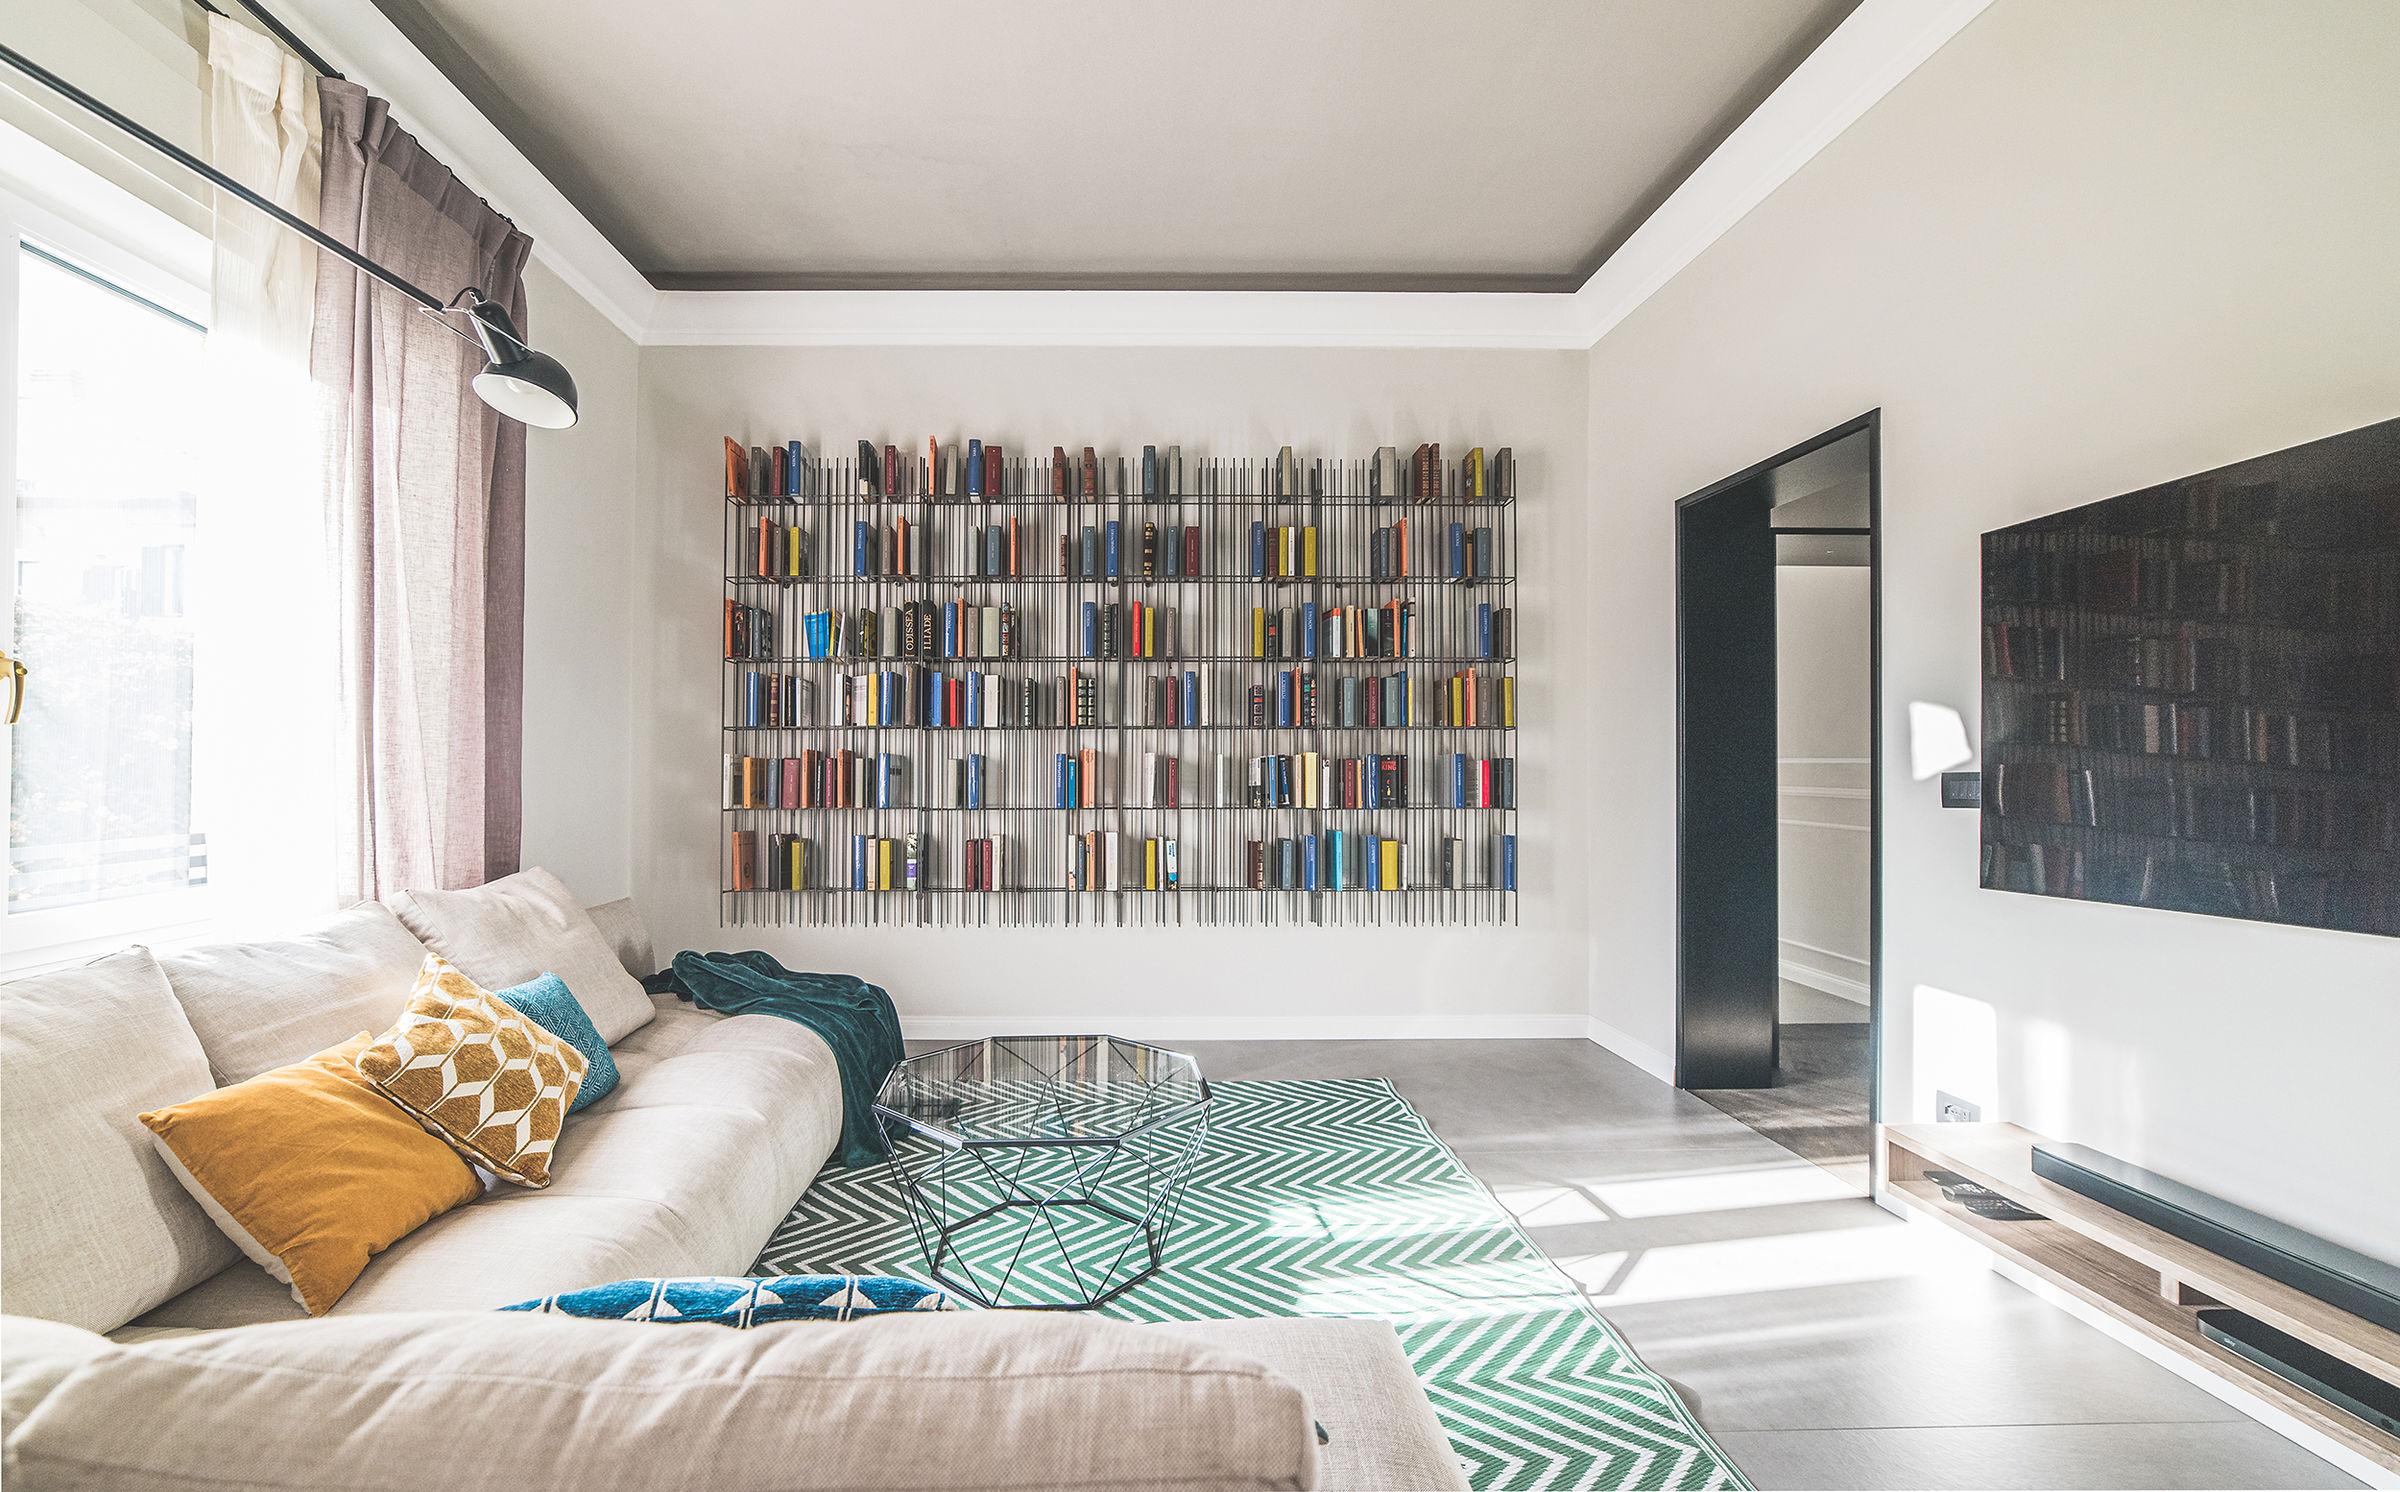 Architettura And Design a+v family house | modo architettura + design | media